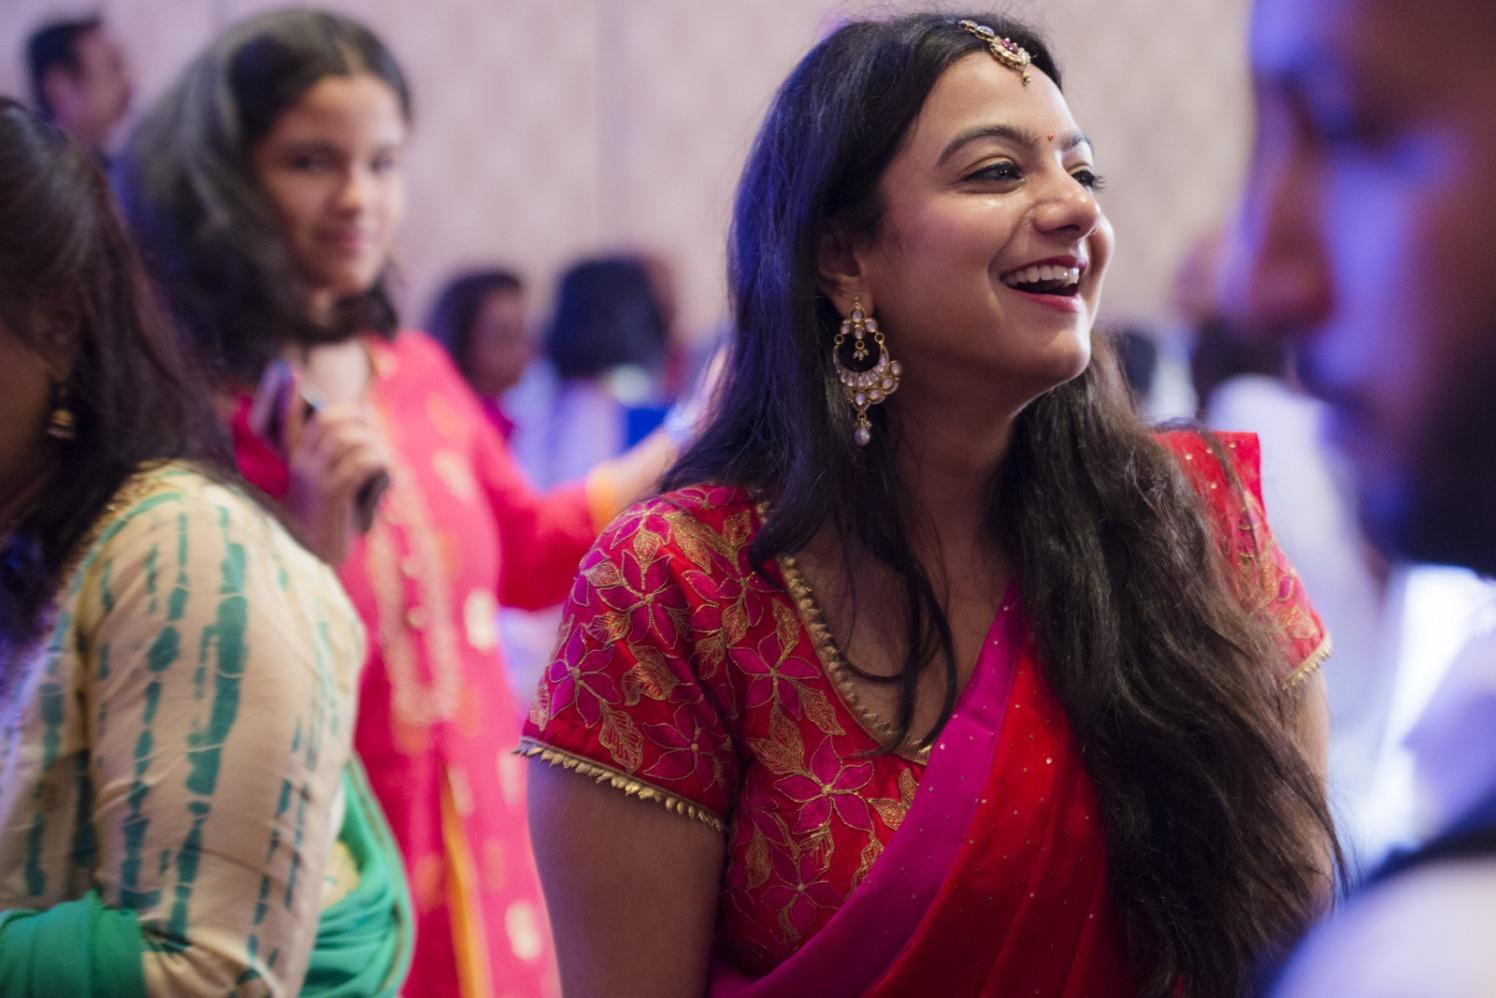 Bridesmaid Wearing Kundan Pearl Earing by Arpit Gulati Wedding-photography | Weddings Photos & Ideas